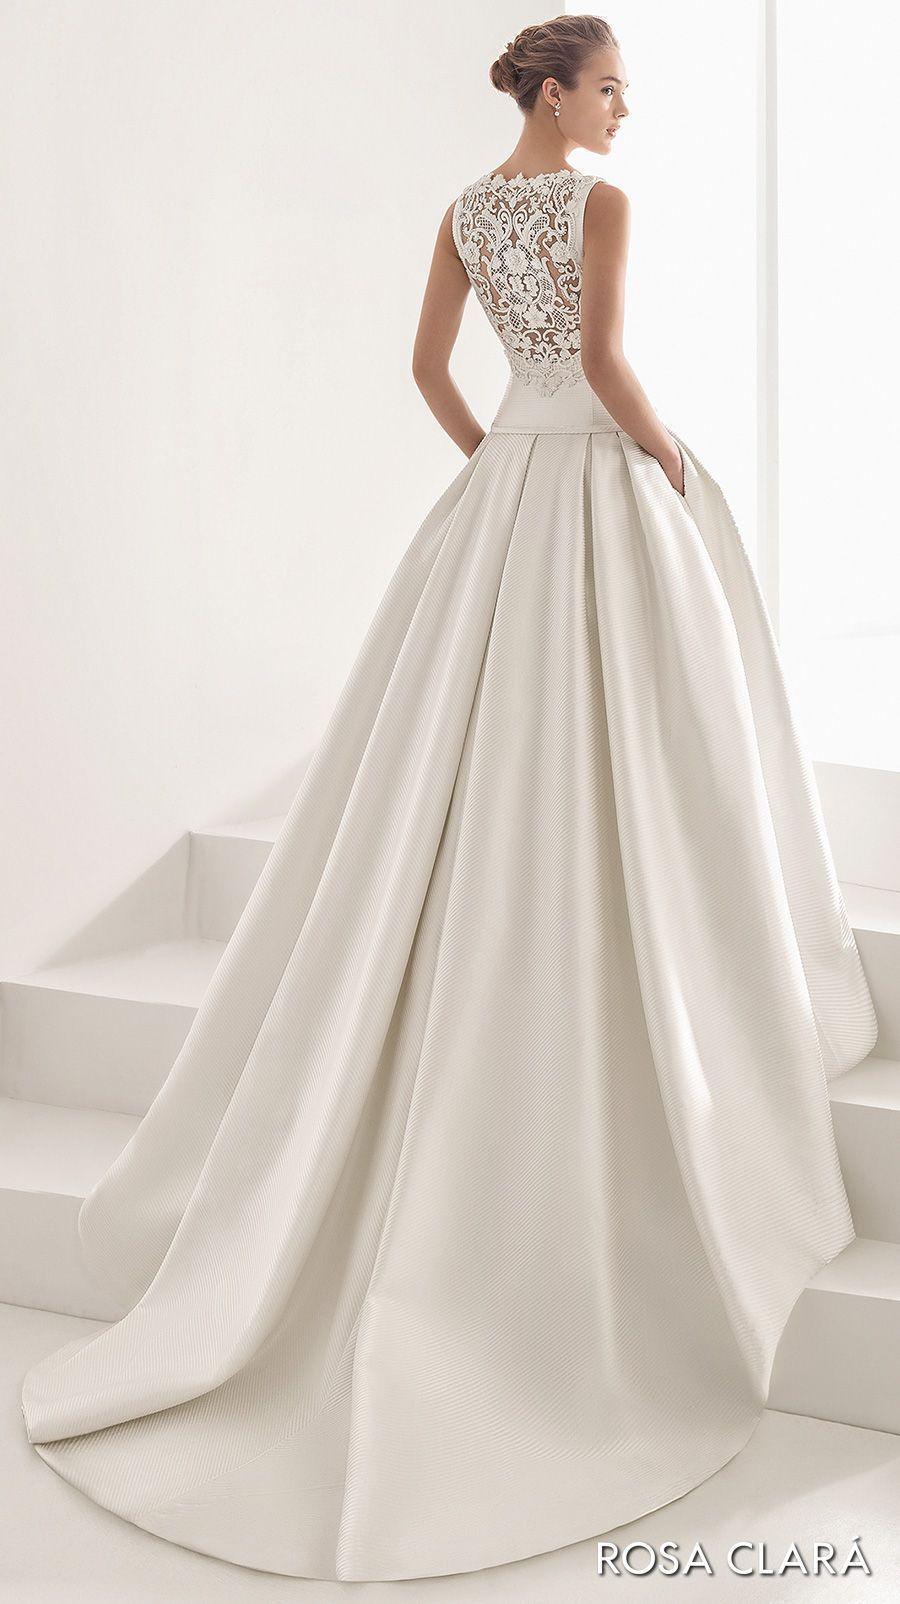 18++ Wedding dress cleaning houston information